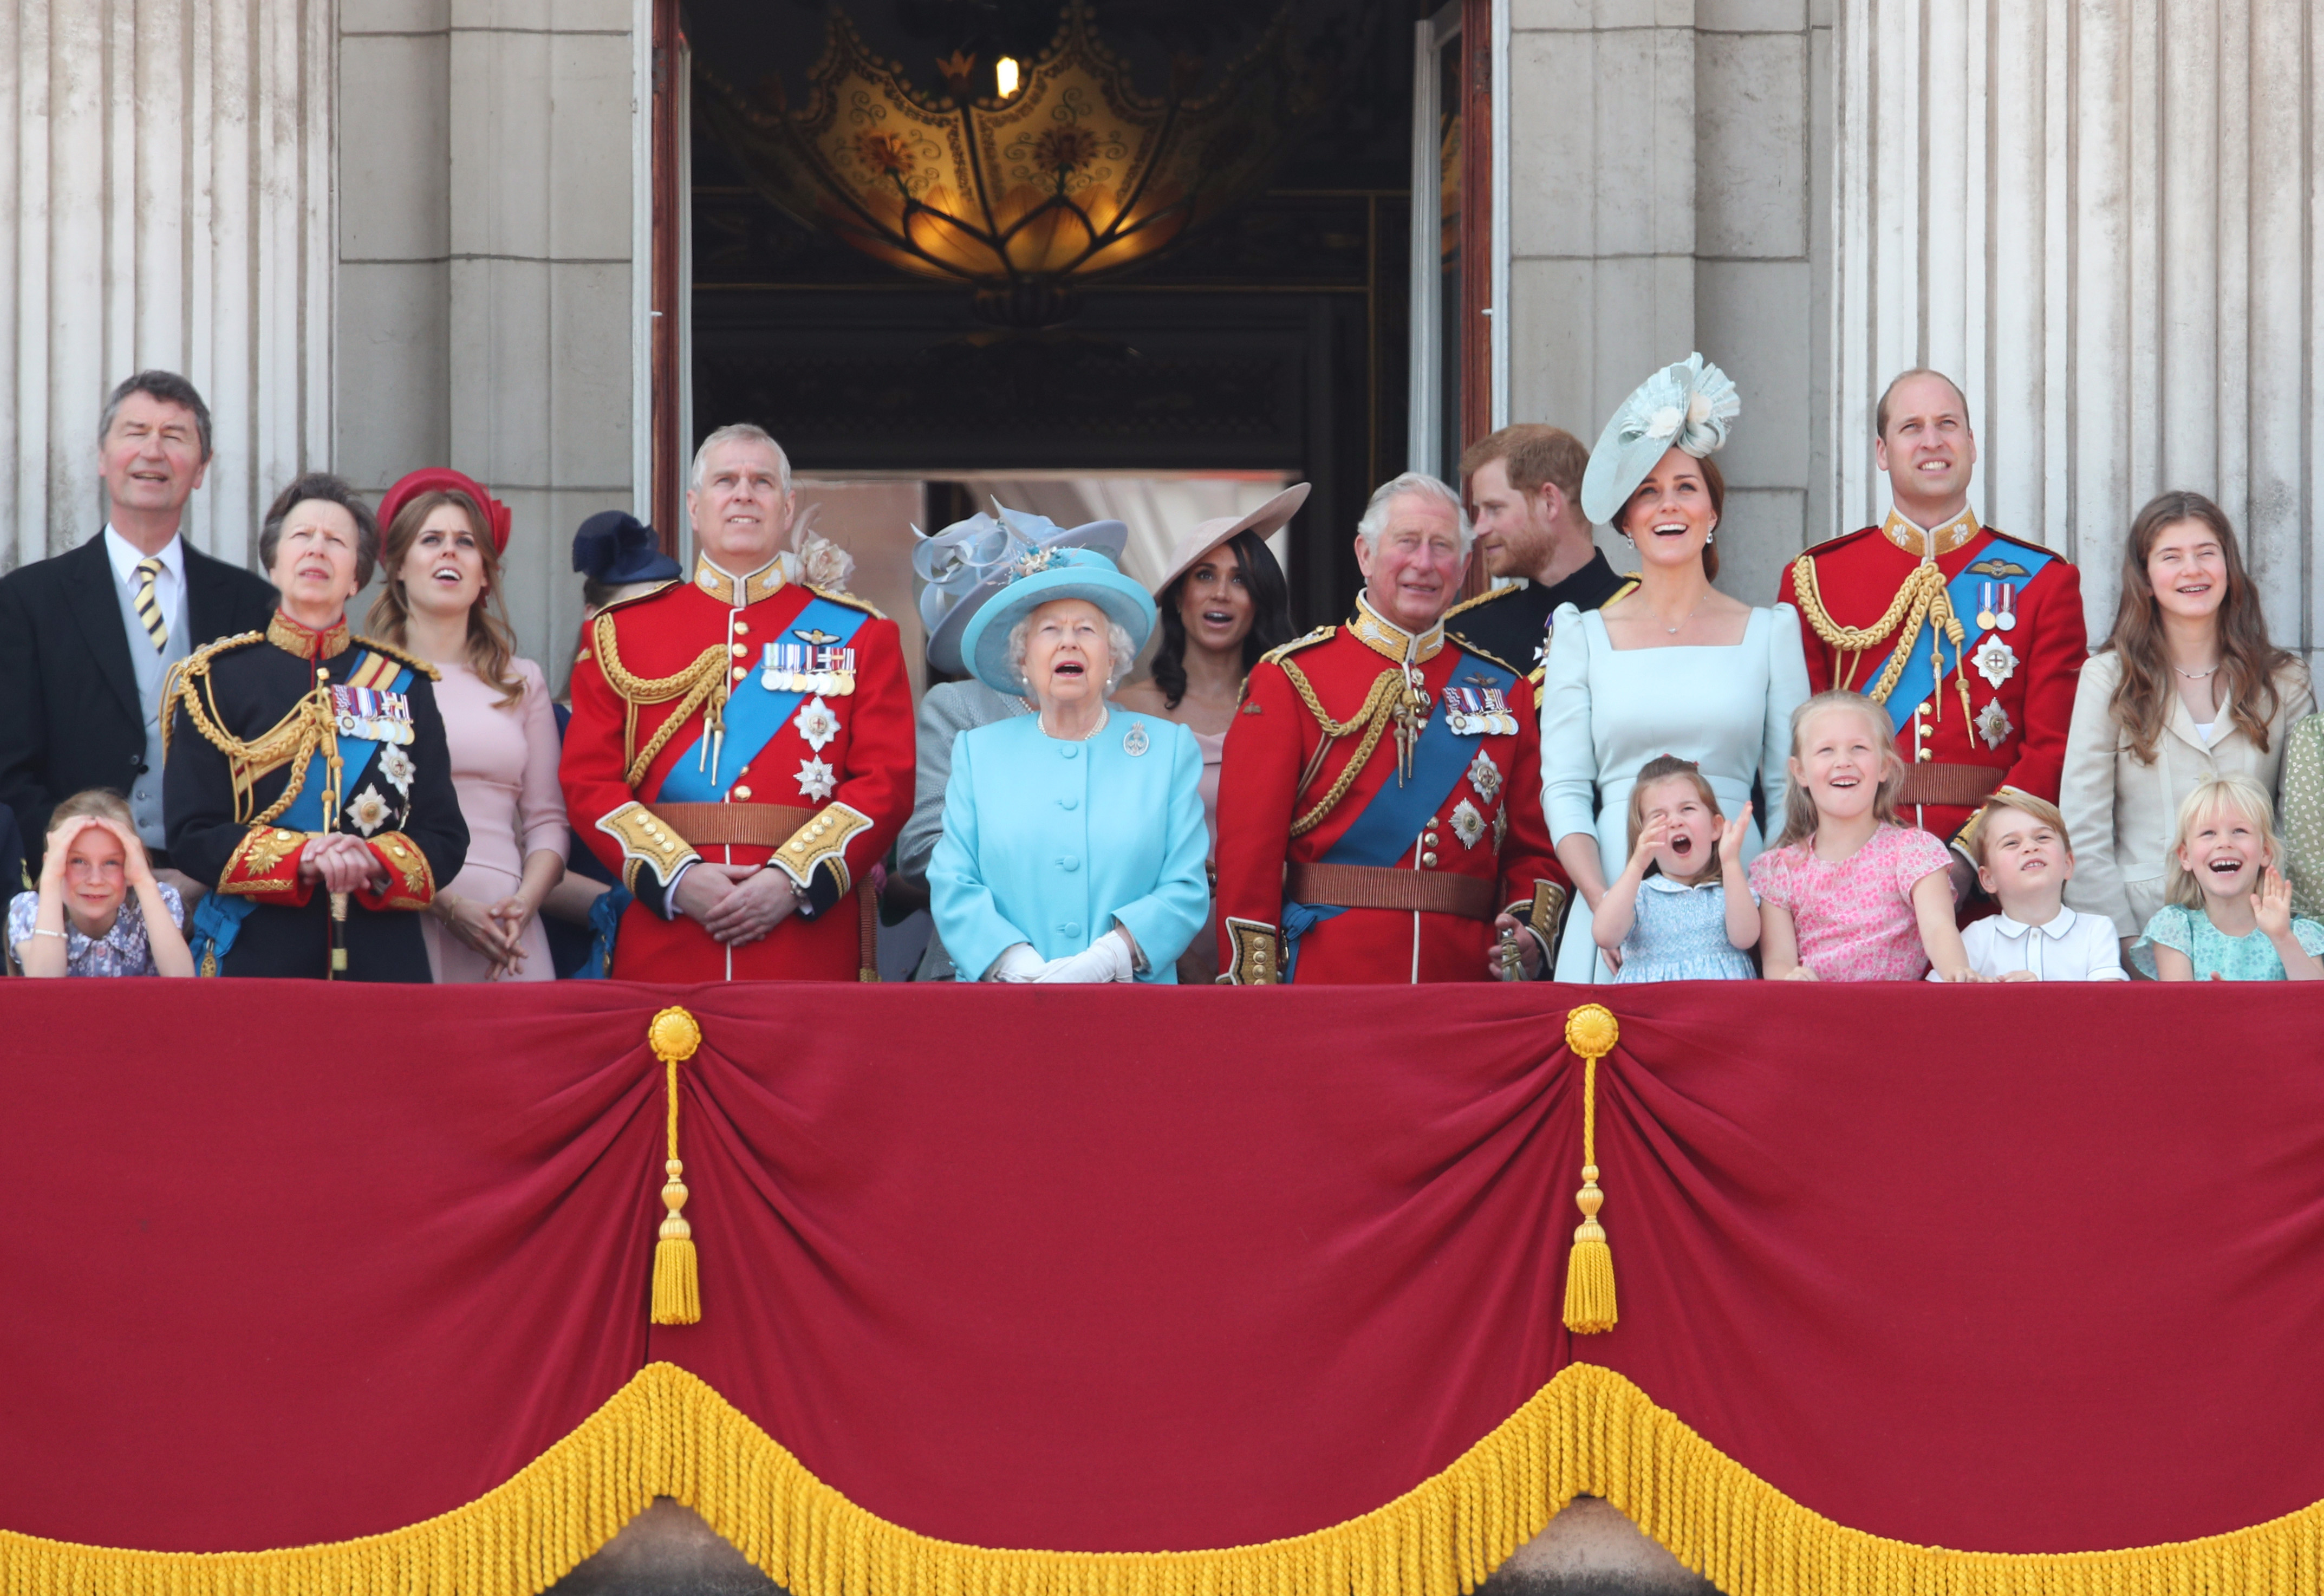 reina Isabel II Príncipe Harry Príncipe William Kate Middleton hijos Meghan Markle